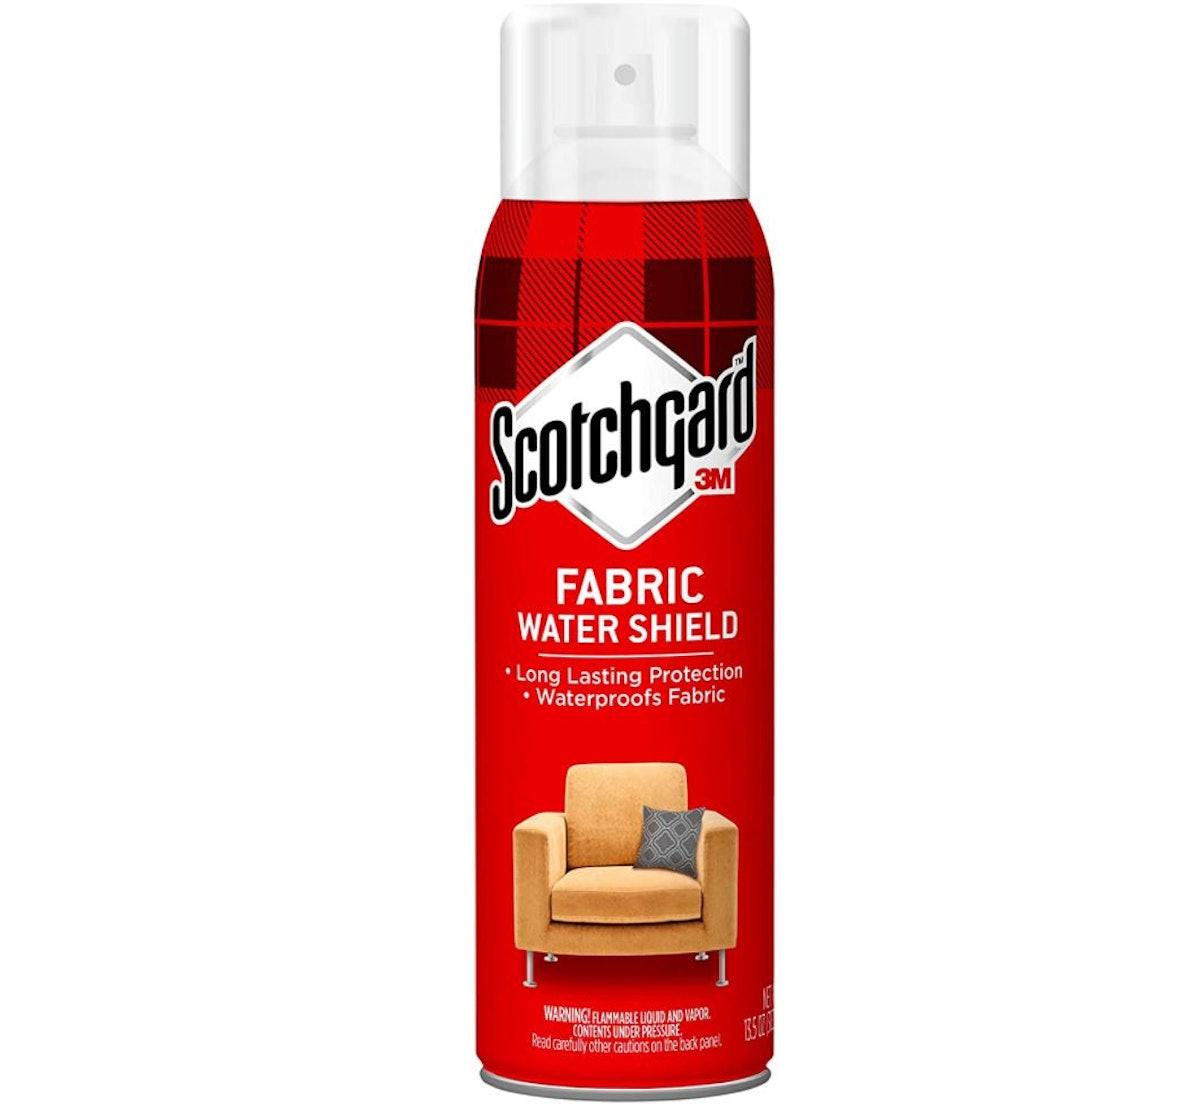 Scotchgard Fabric Water Shield